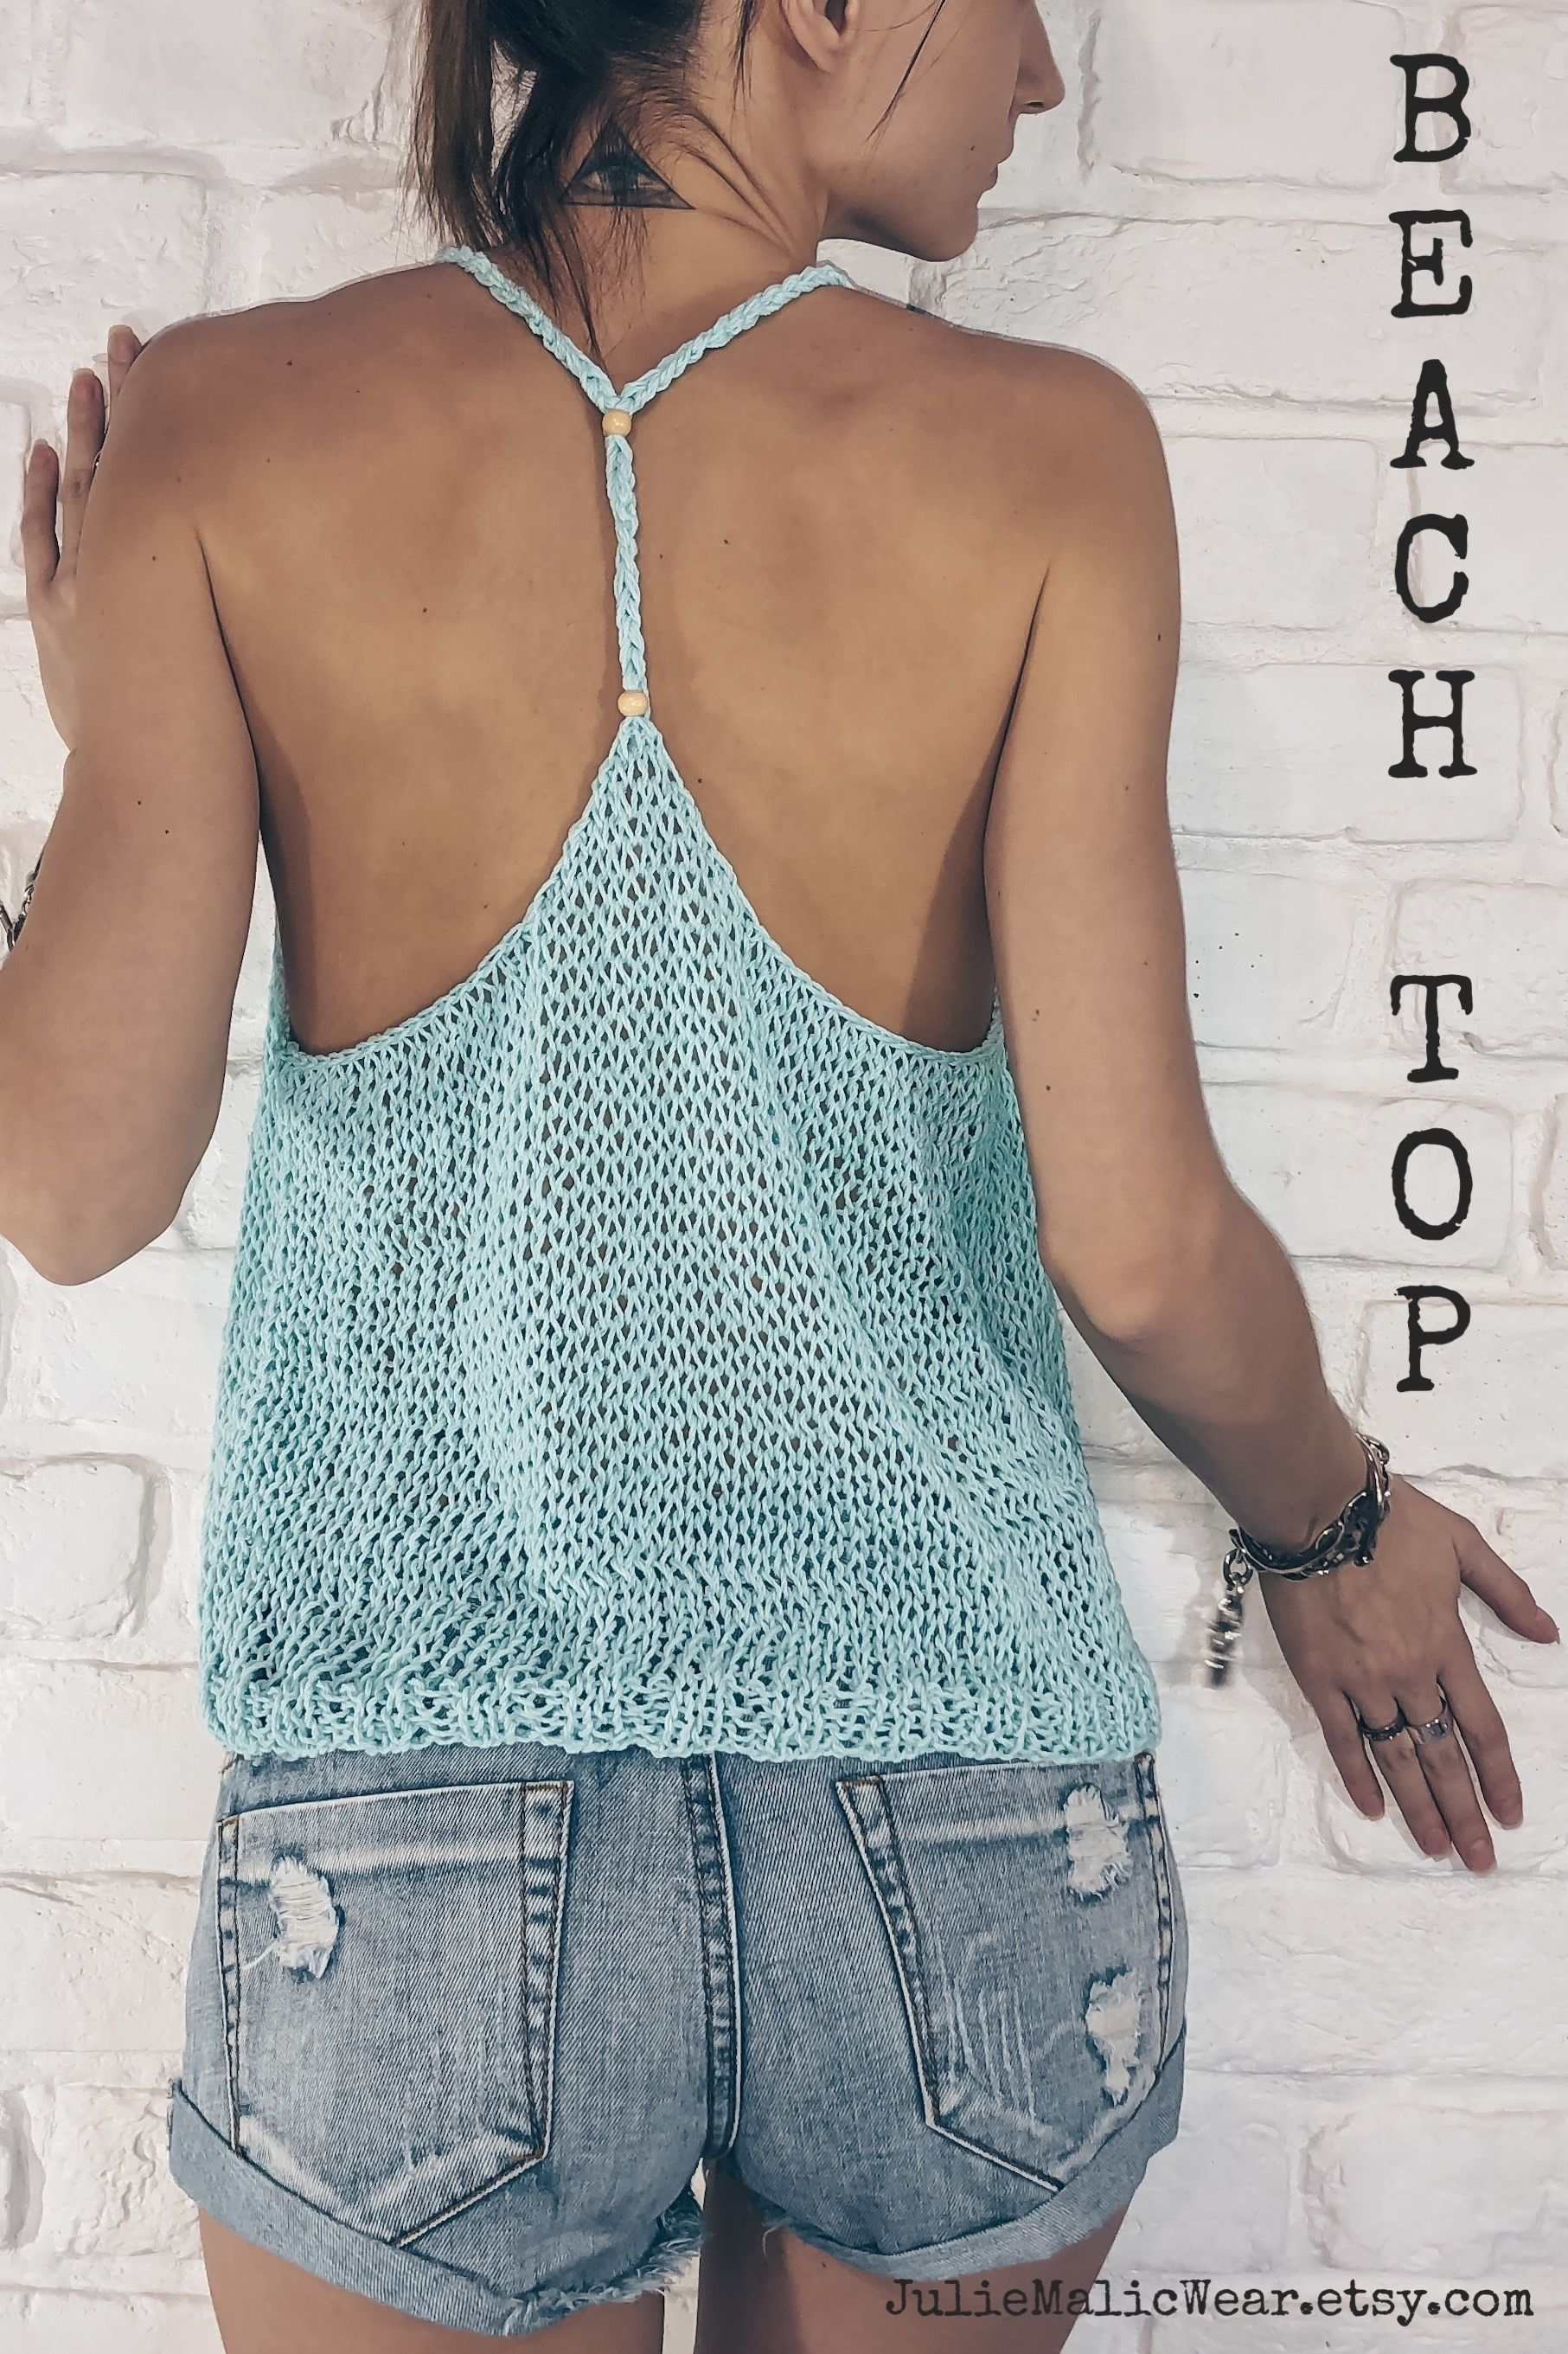 Open back halter top style cropped bra top shirt Crochet crop top Womens handmade crop top shirt Boho clothing Minimalist fashion